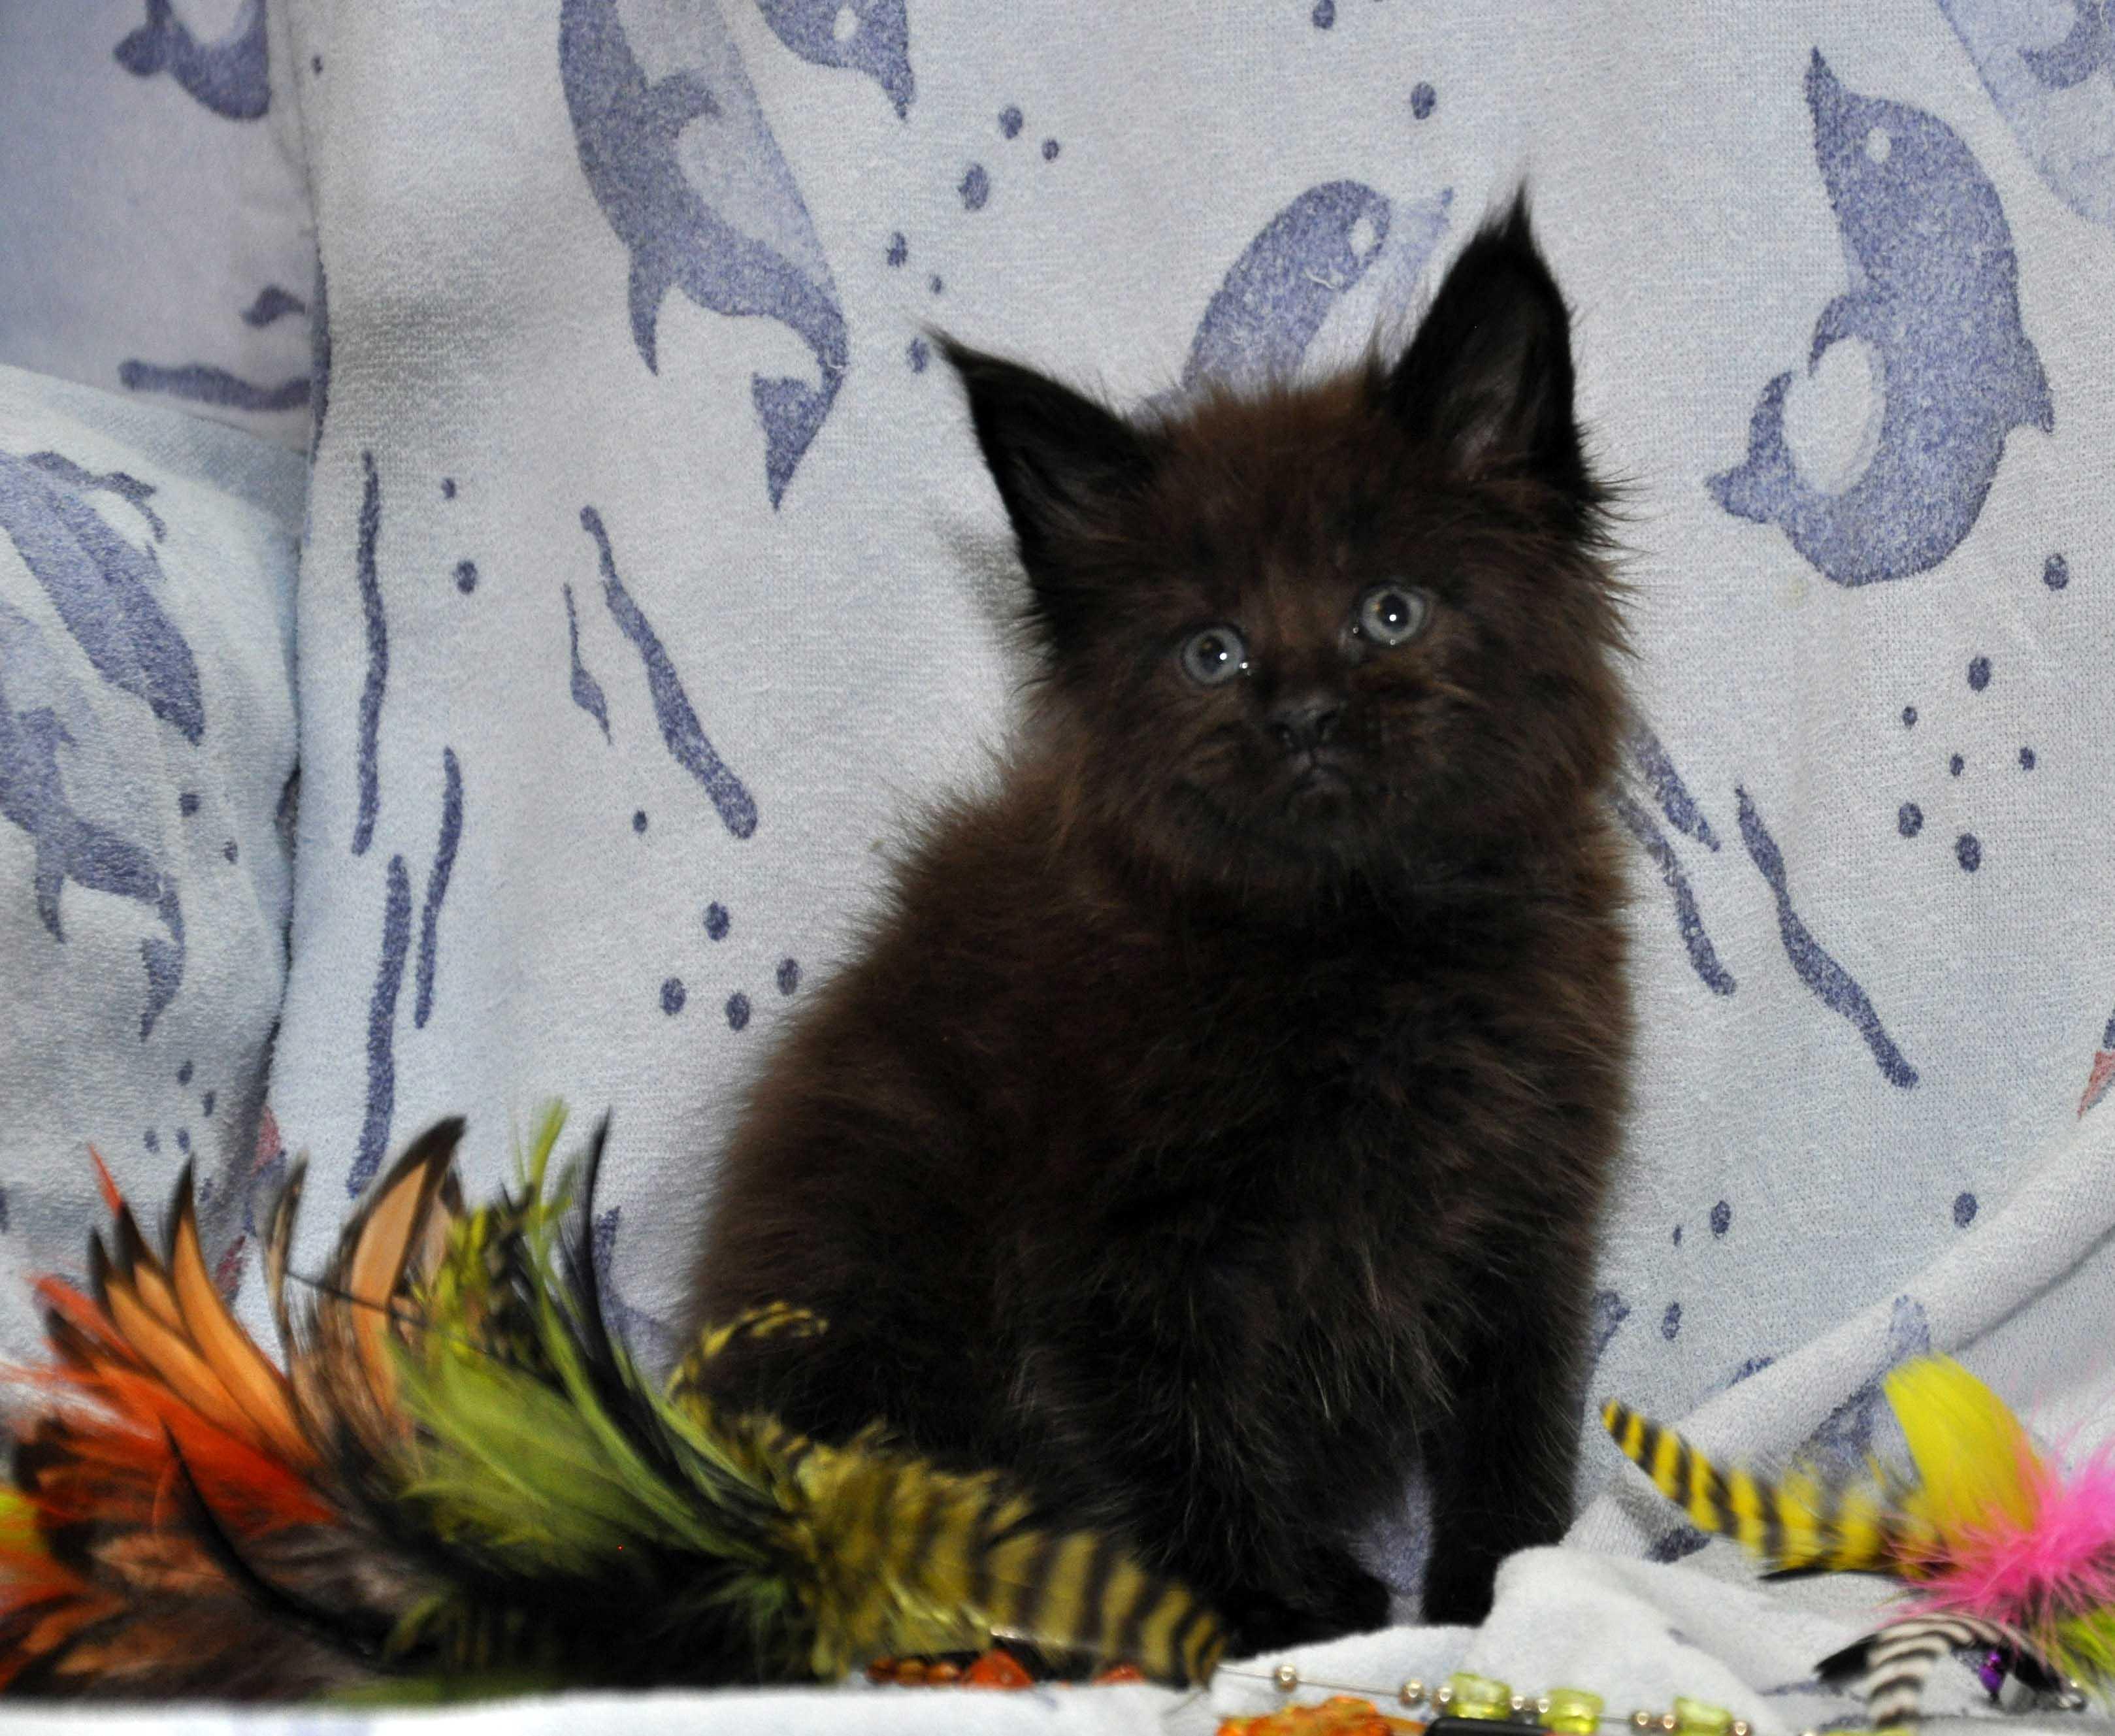 Кот Мейн Кун 3 (male) Eyktan QUAKE фото 1